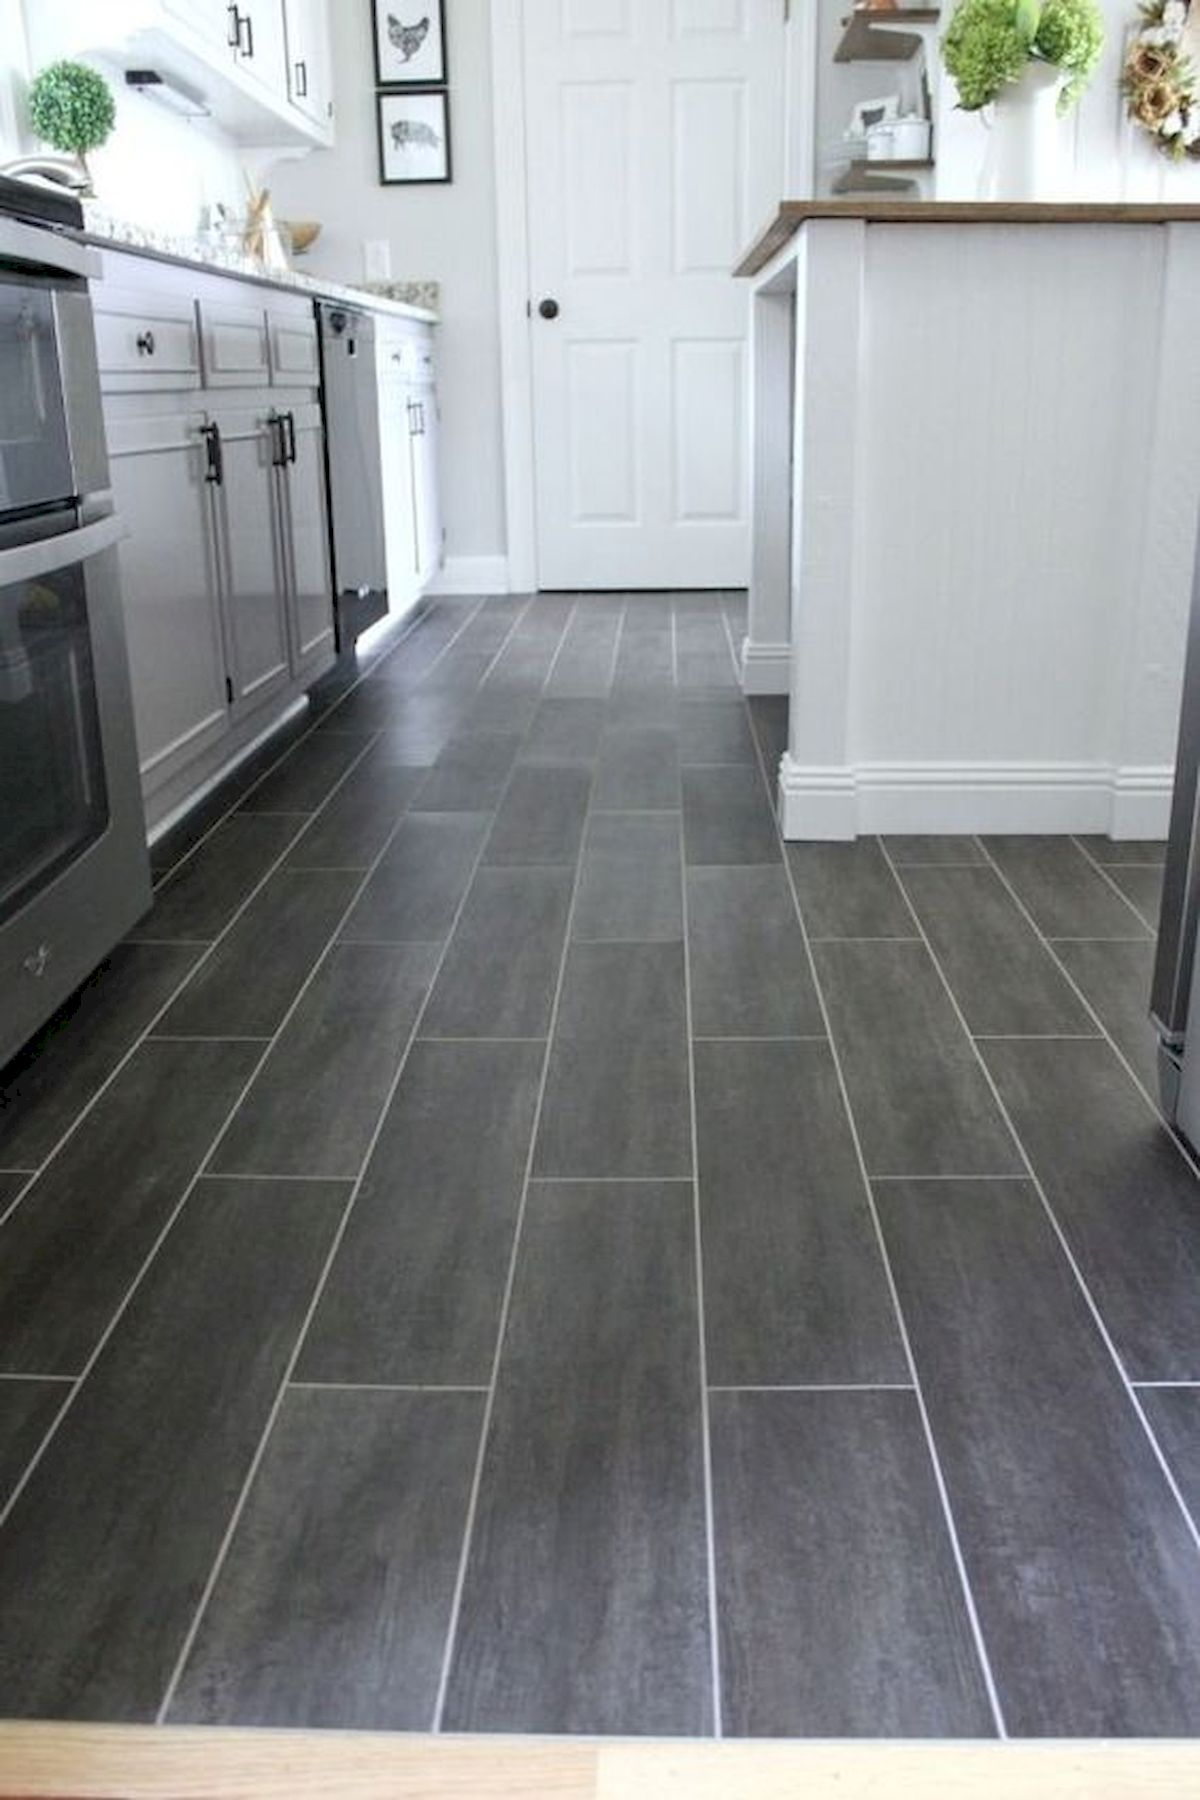 40 Best Tile Flooring Designs Ideas For Modern Kitchen (23)